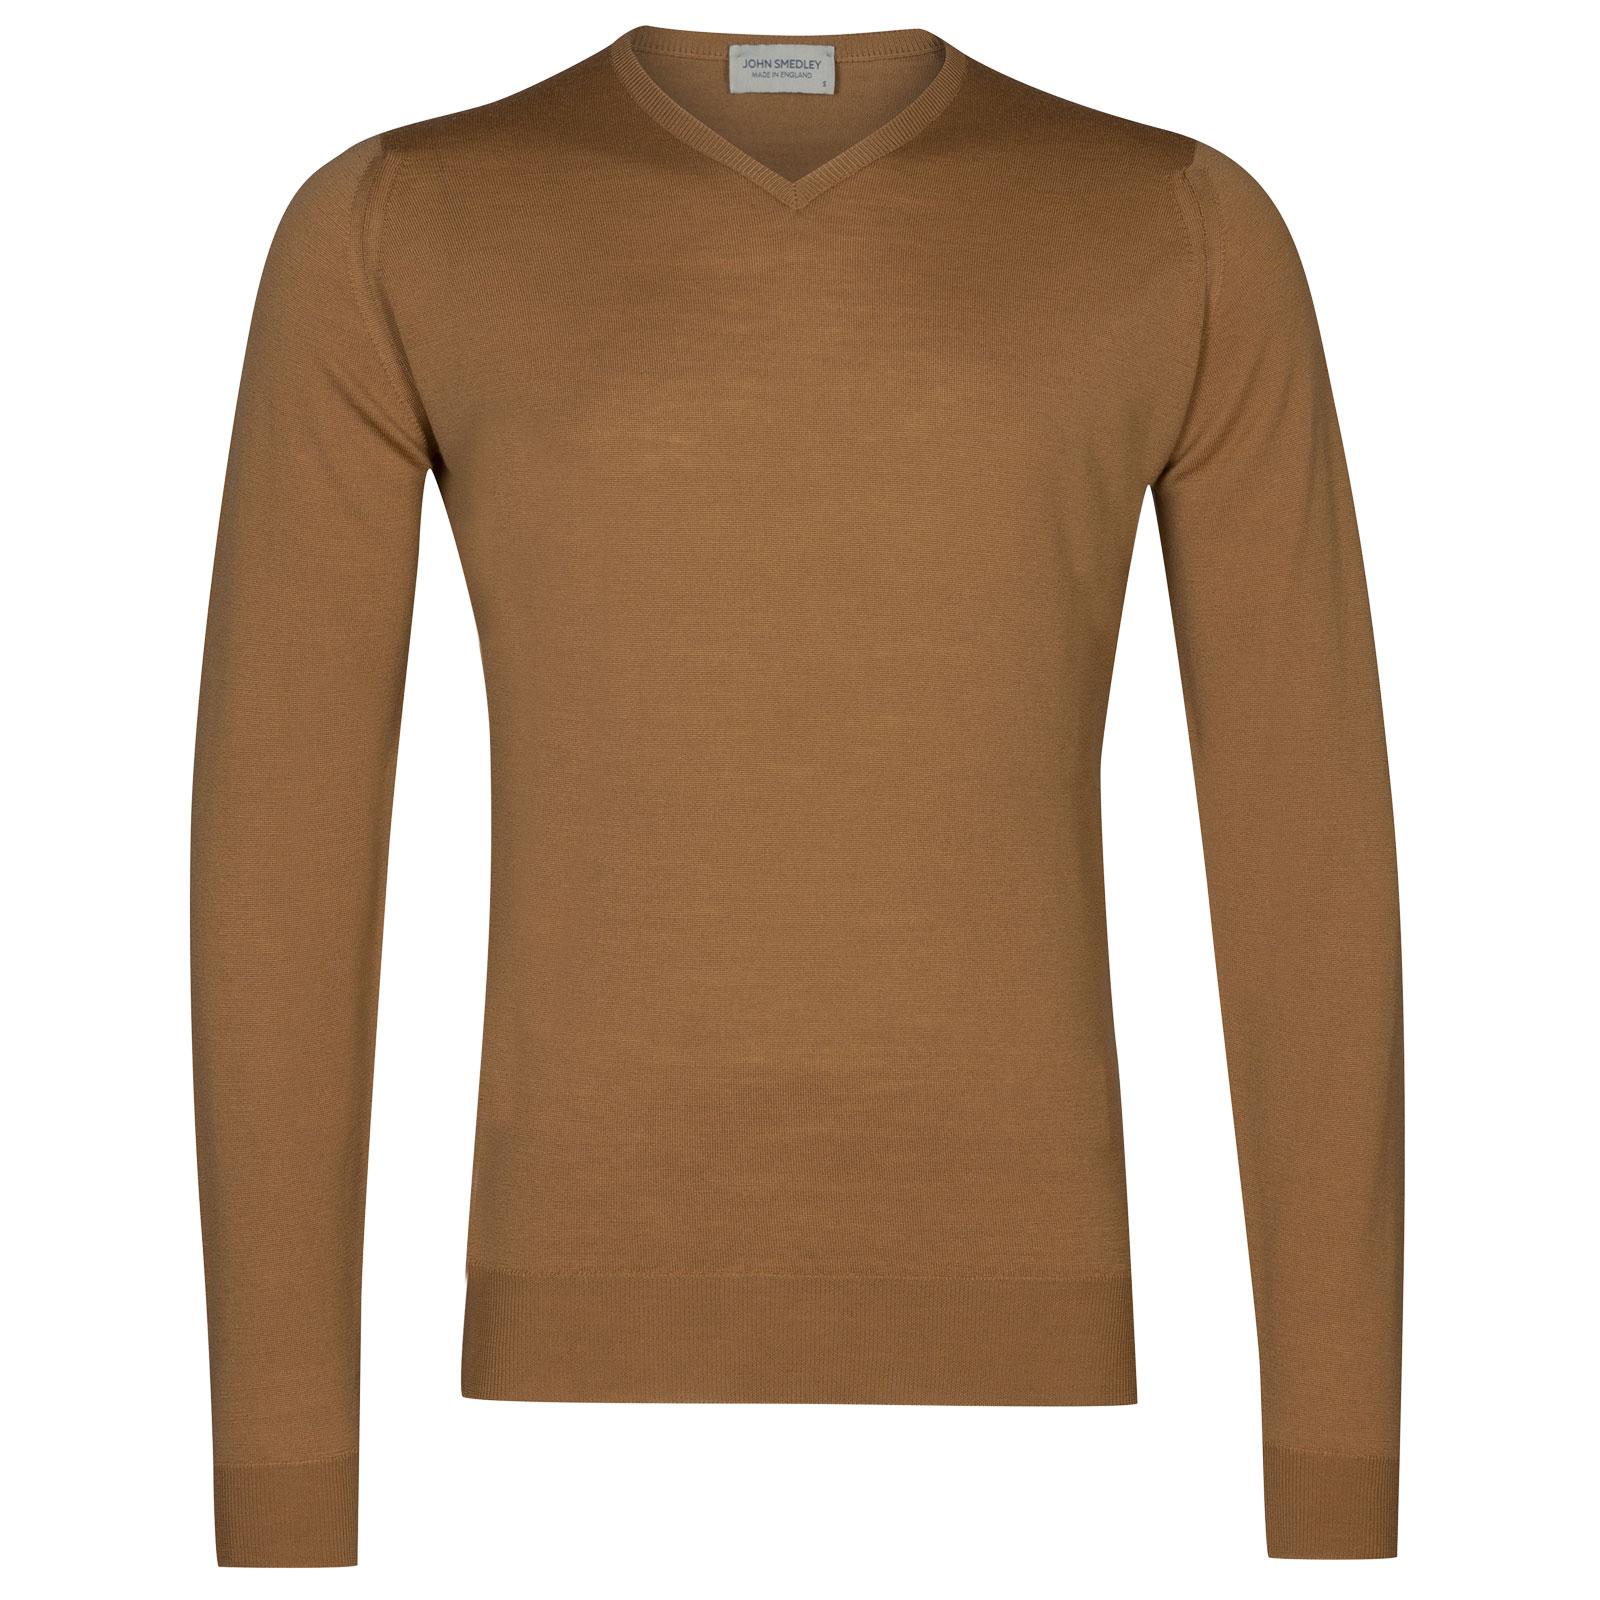 John Smedley shipton Merino Wool Pullover in Camel-XXL